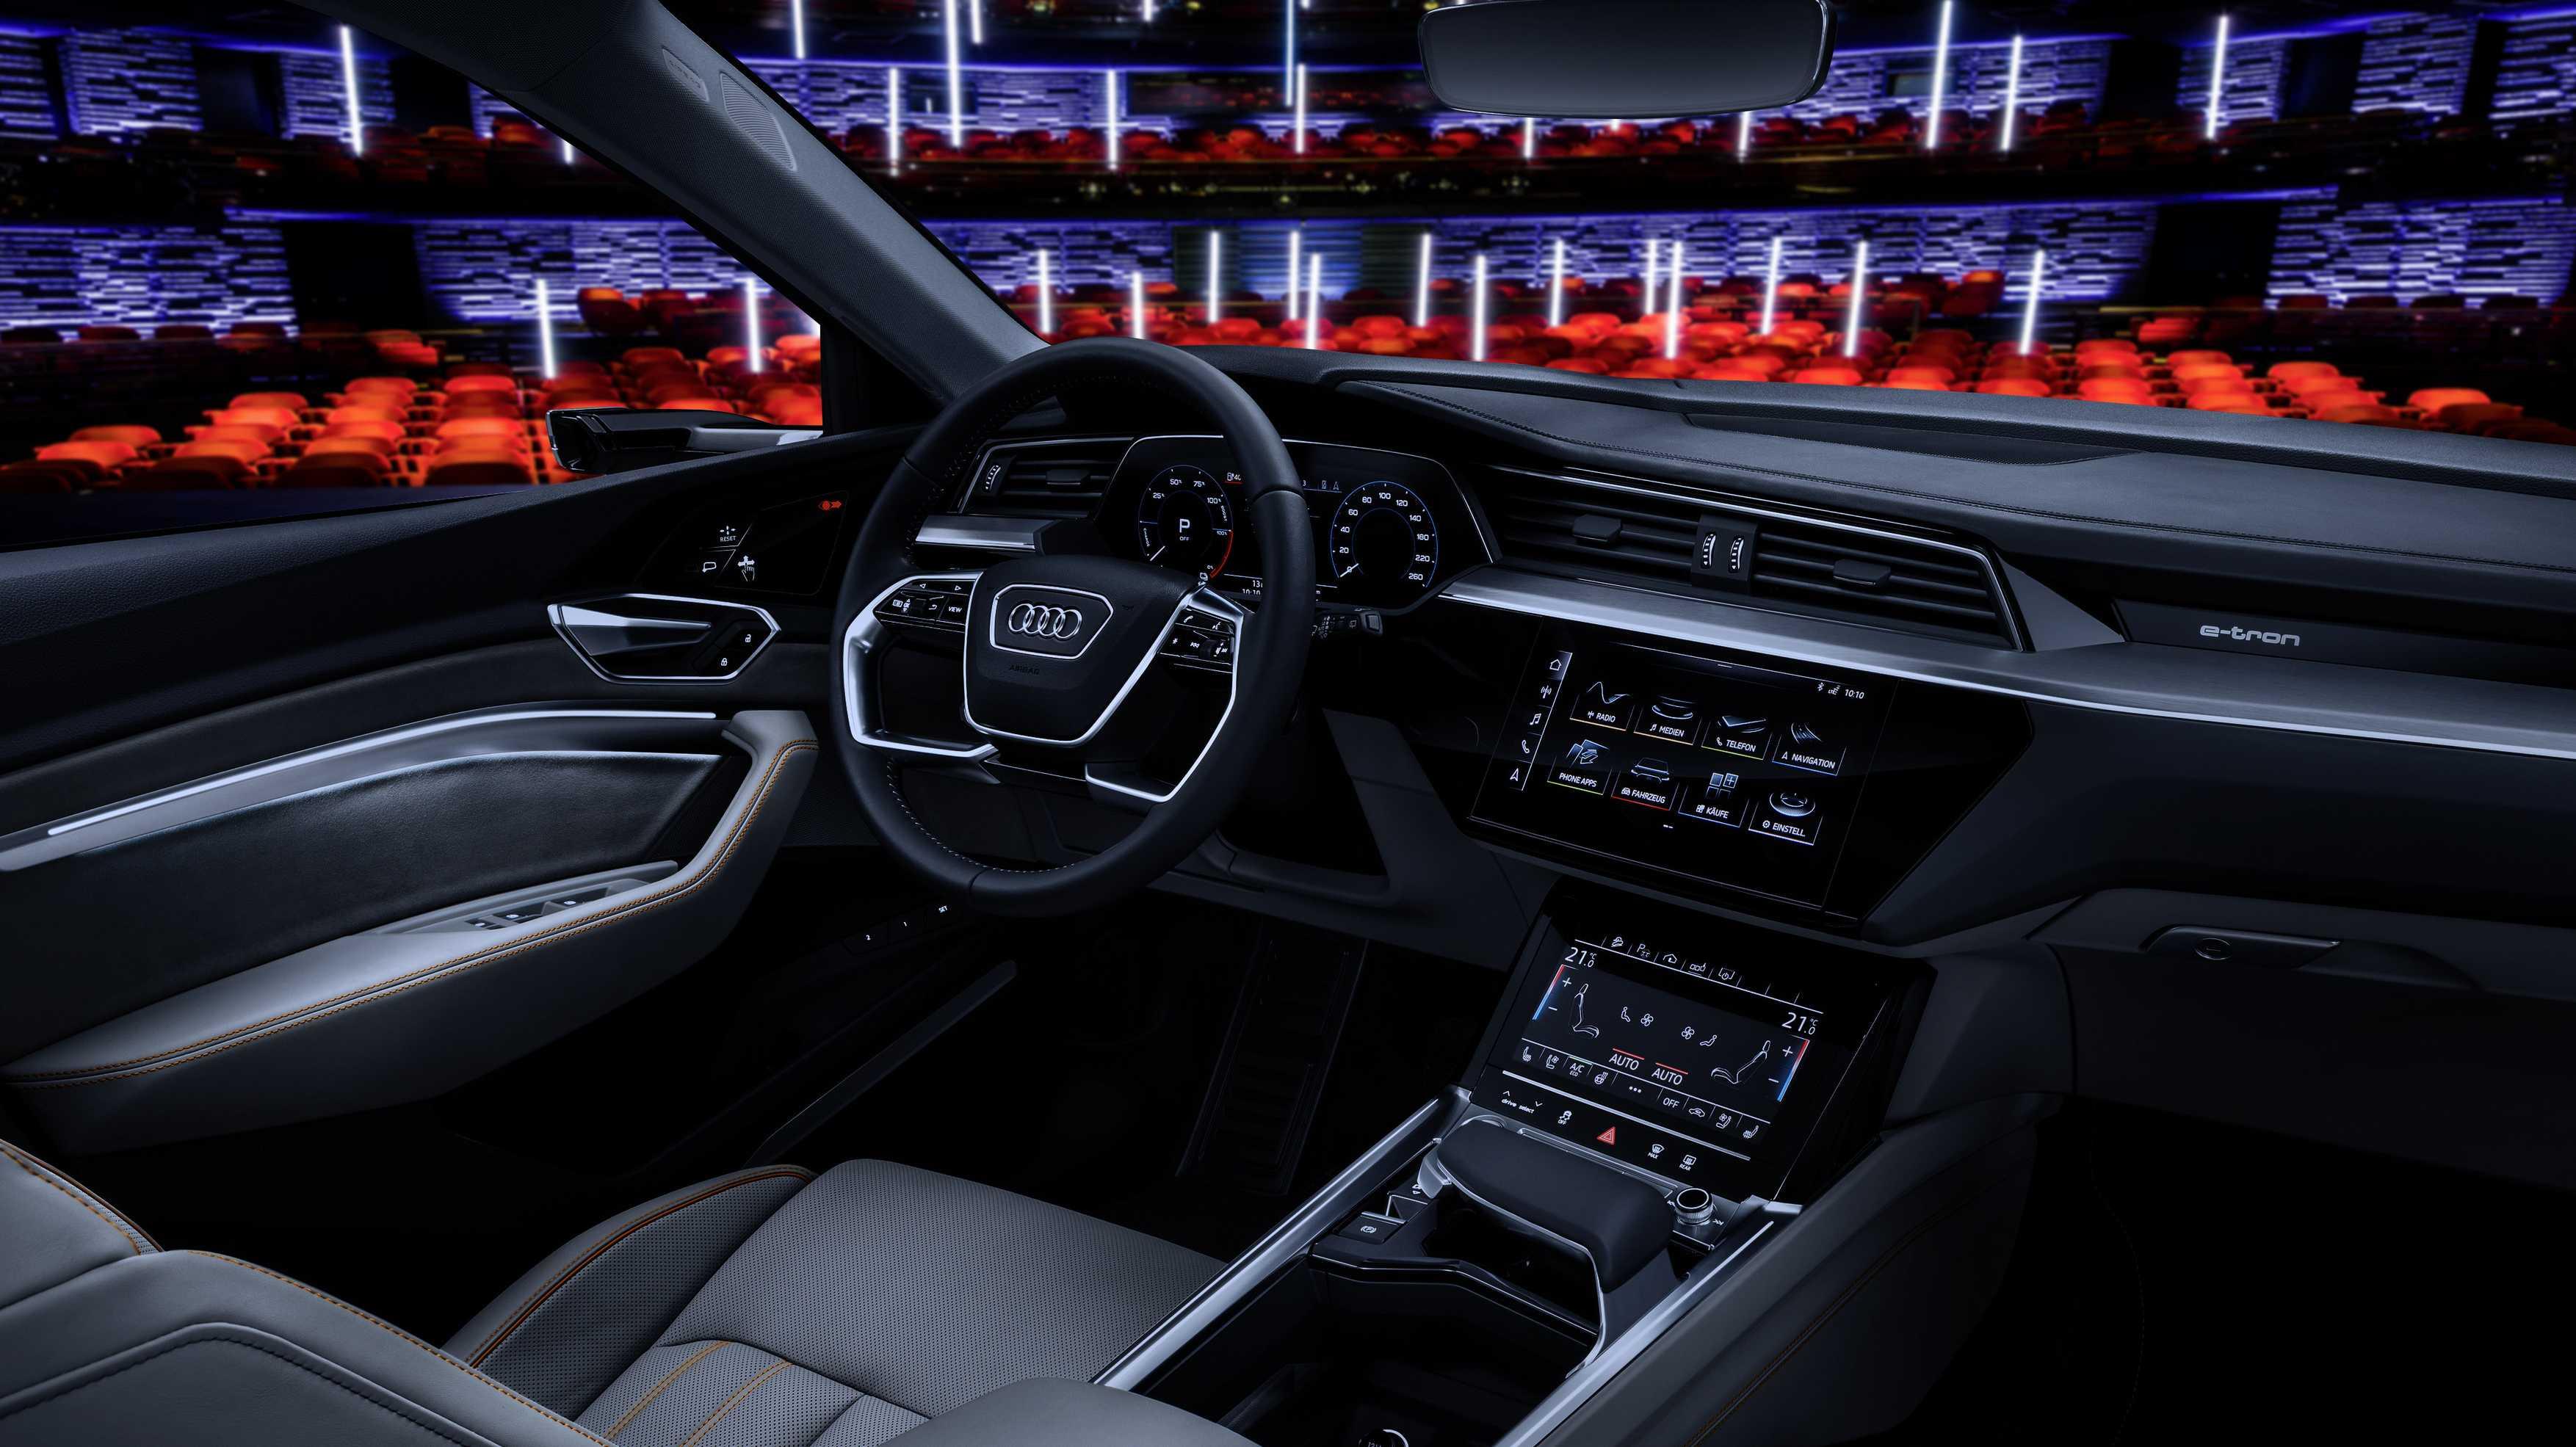 Elektroauto: Audis e-tron bekommt virtuelle Außenspiegel